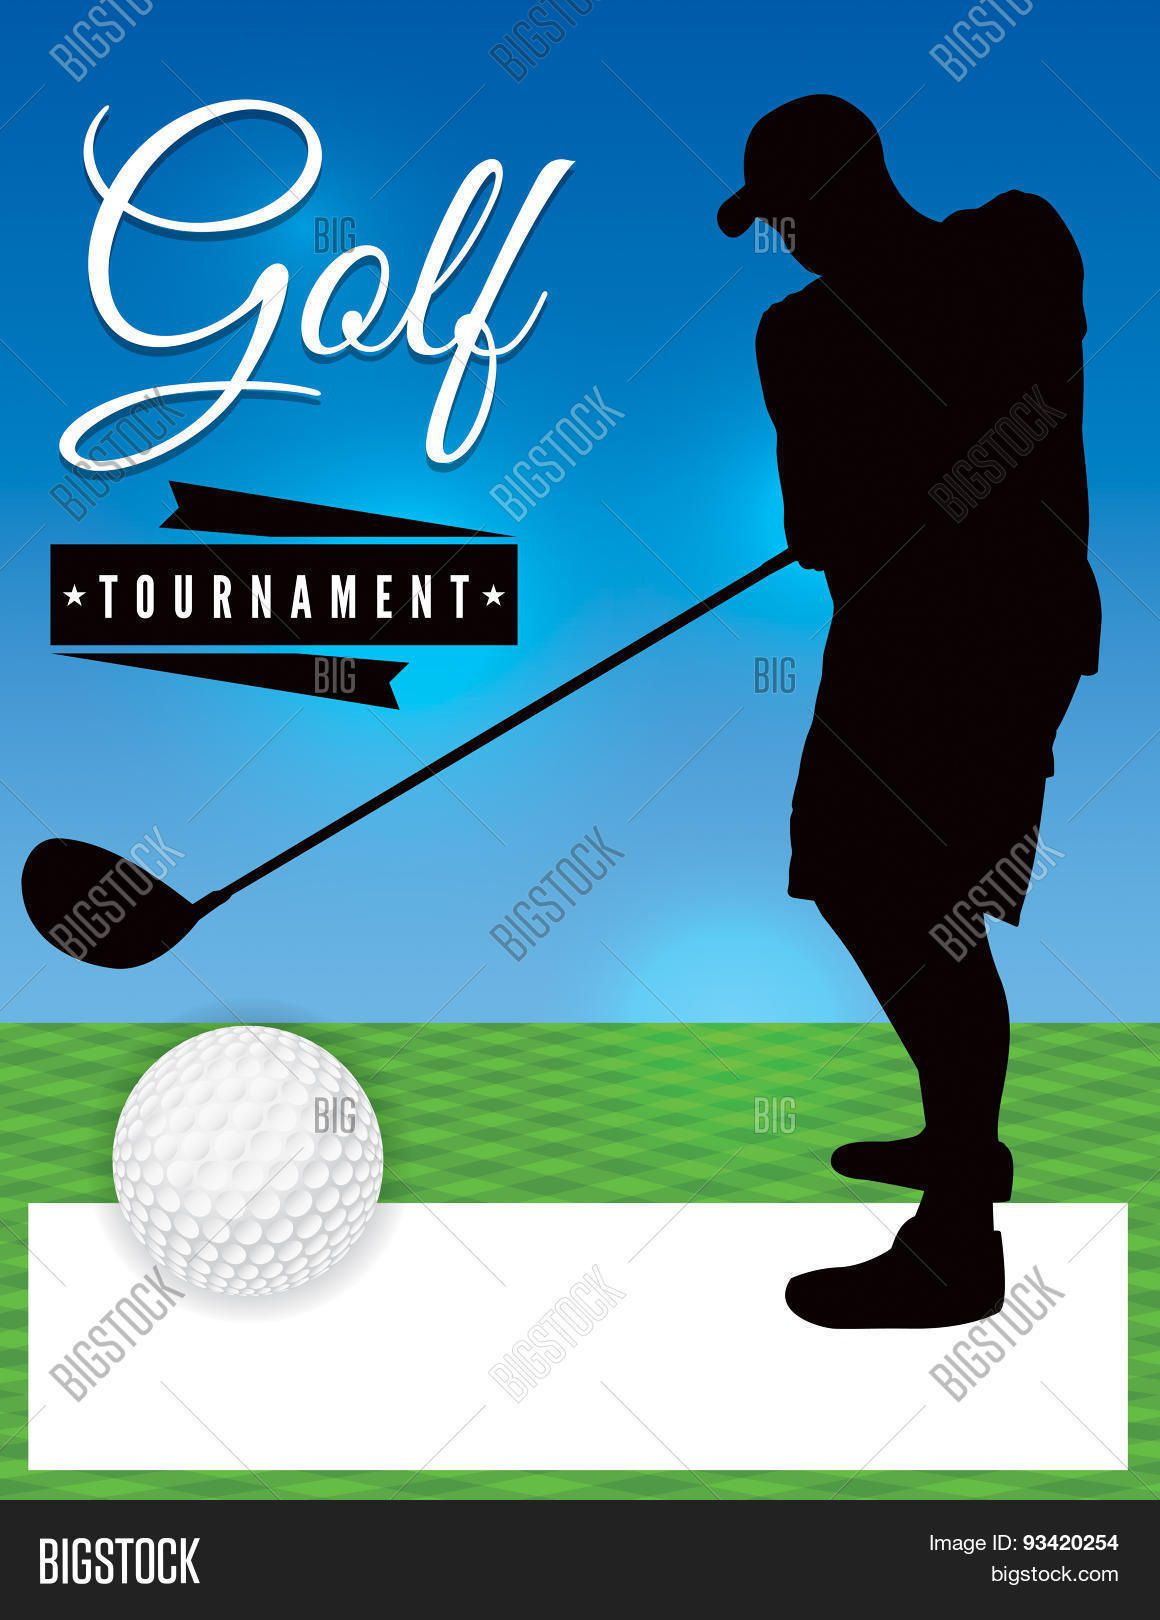 003 Stupendou Free Charity Golf Tournament Flyer Template Design Full